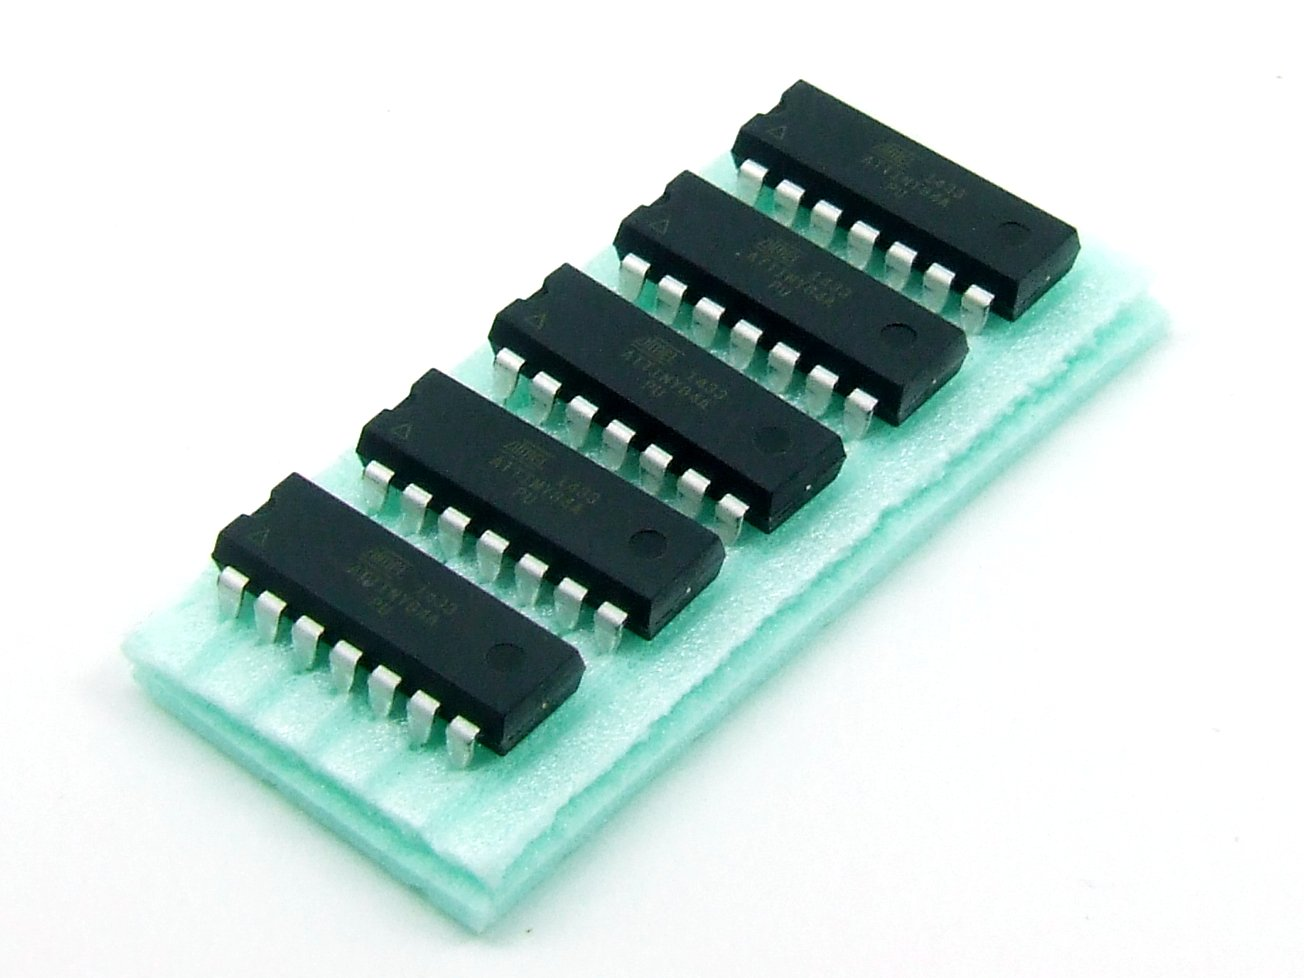 Pezzi / pcs. 5 x ATTINY 84A-PU MCU ATMEL AVR compatibile Arduino / Arduino compatible #A345 Just-Honest DEA345H